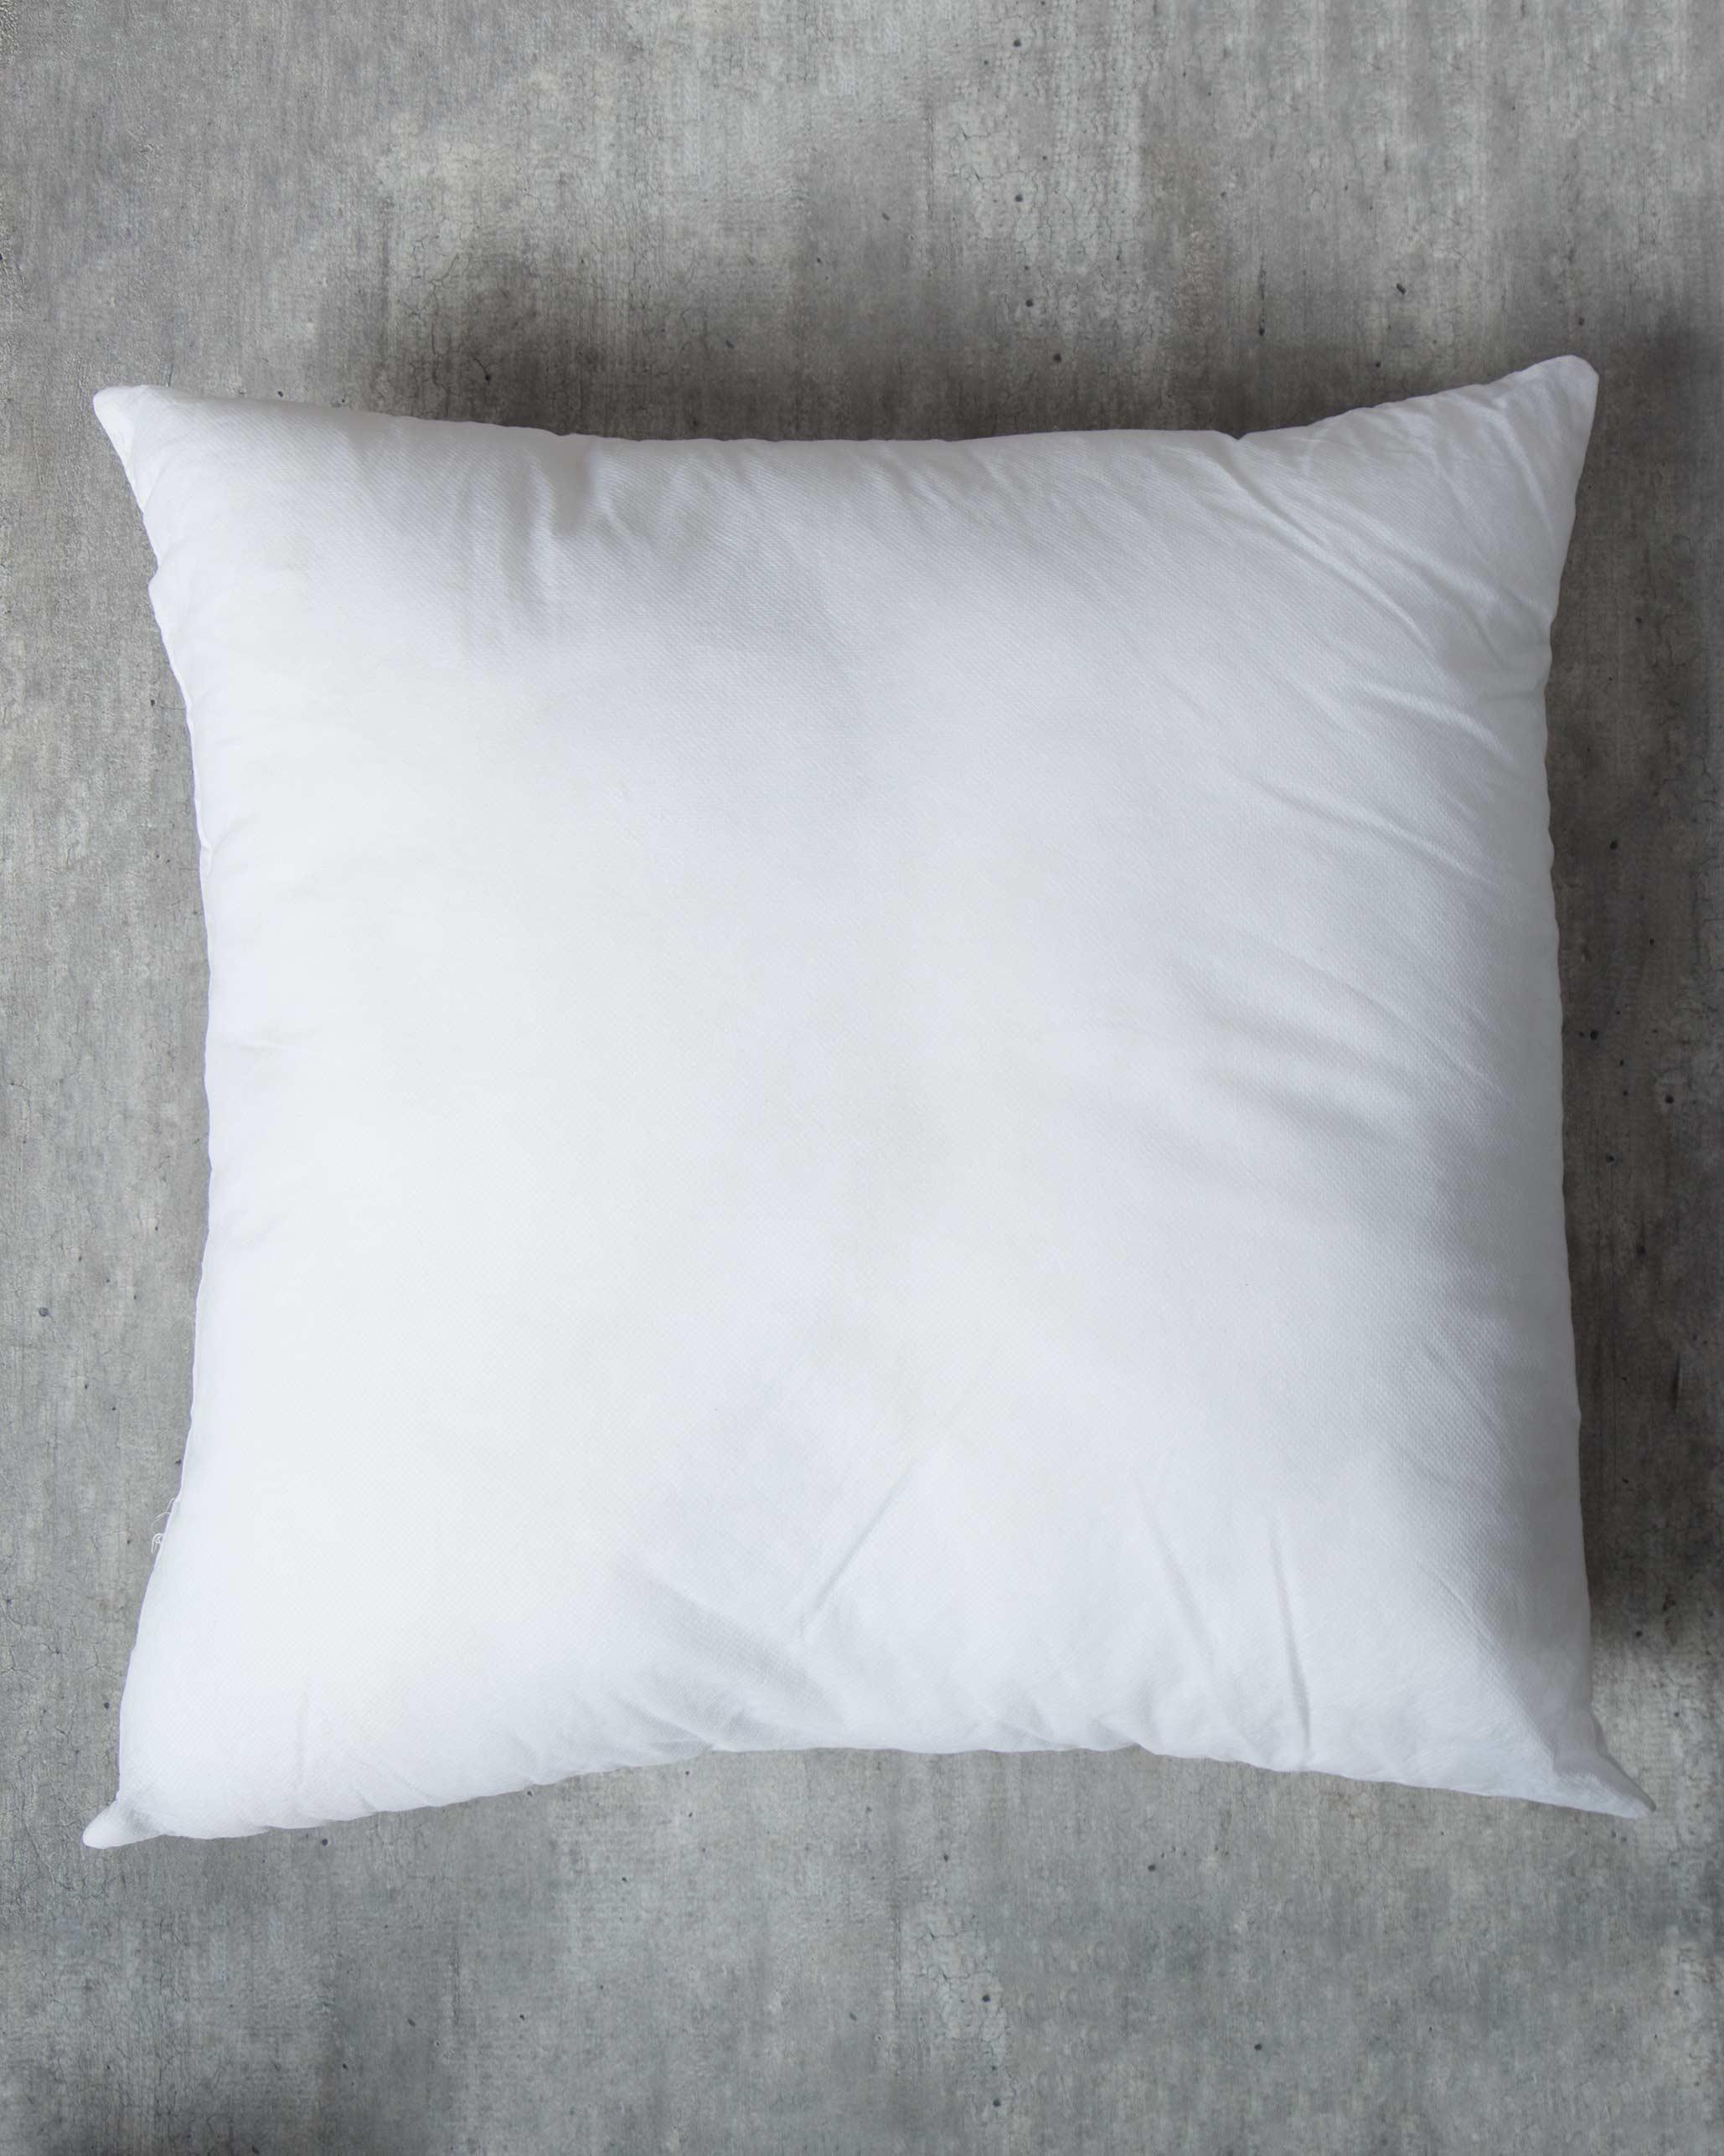 filler inserts pillow fluffy packed pillowcubes img insert blog vacuum